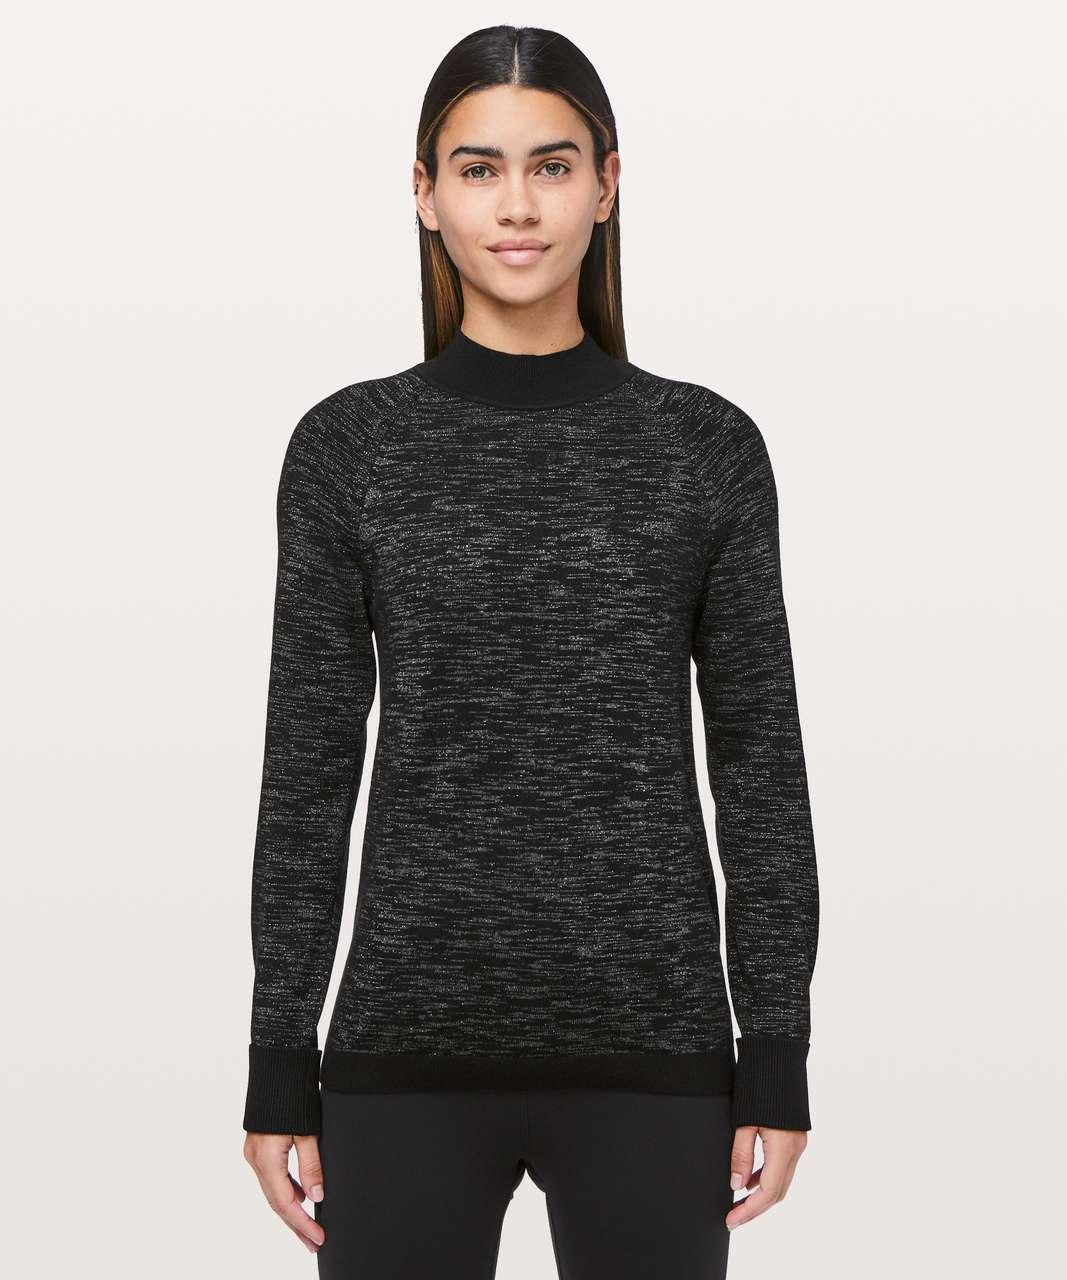 7b81420b8bb Lululemon Soft Shine Sweater - Black / Steel Grey